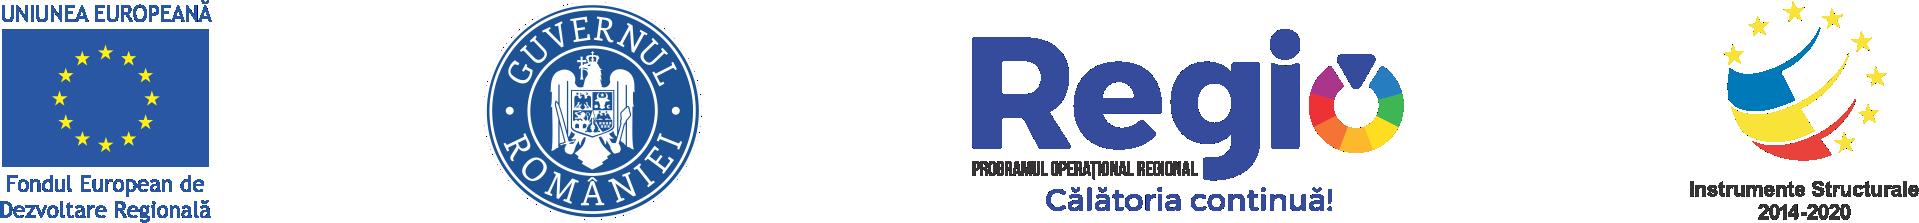 Banner-ue-regio-ro-globalprint